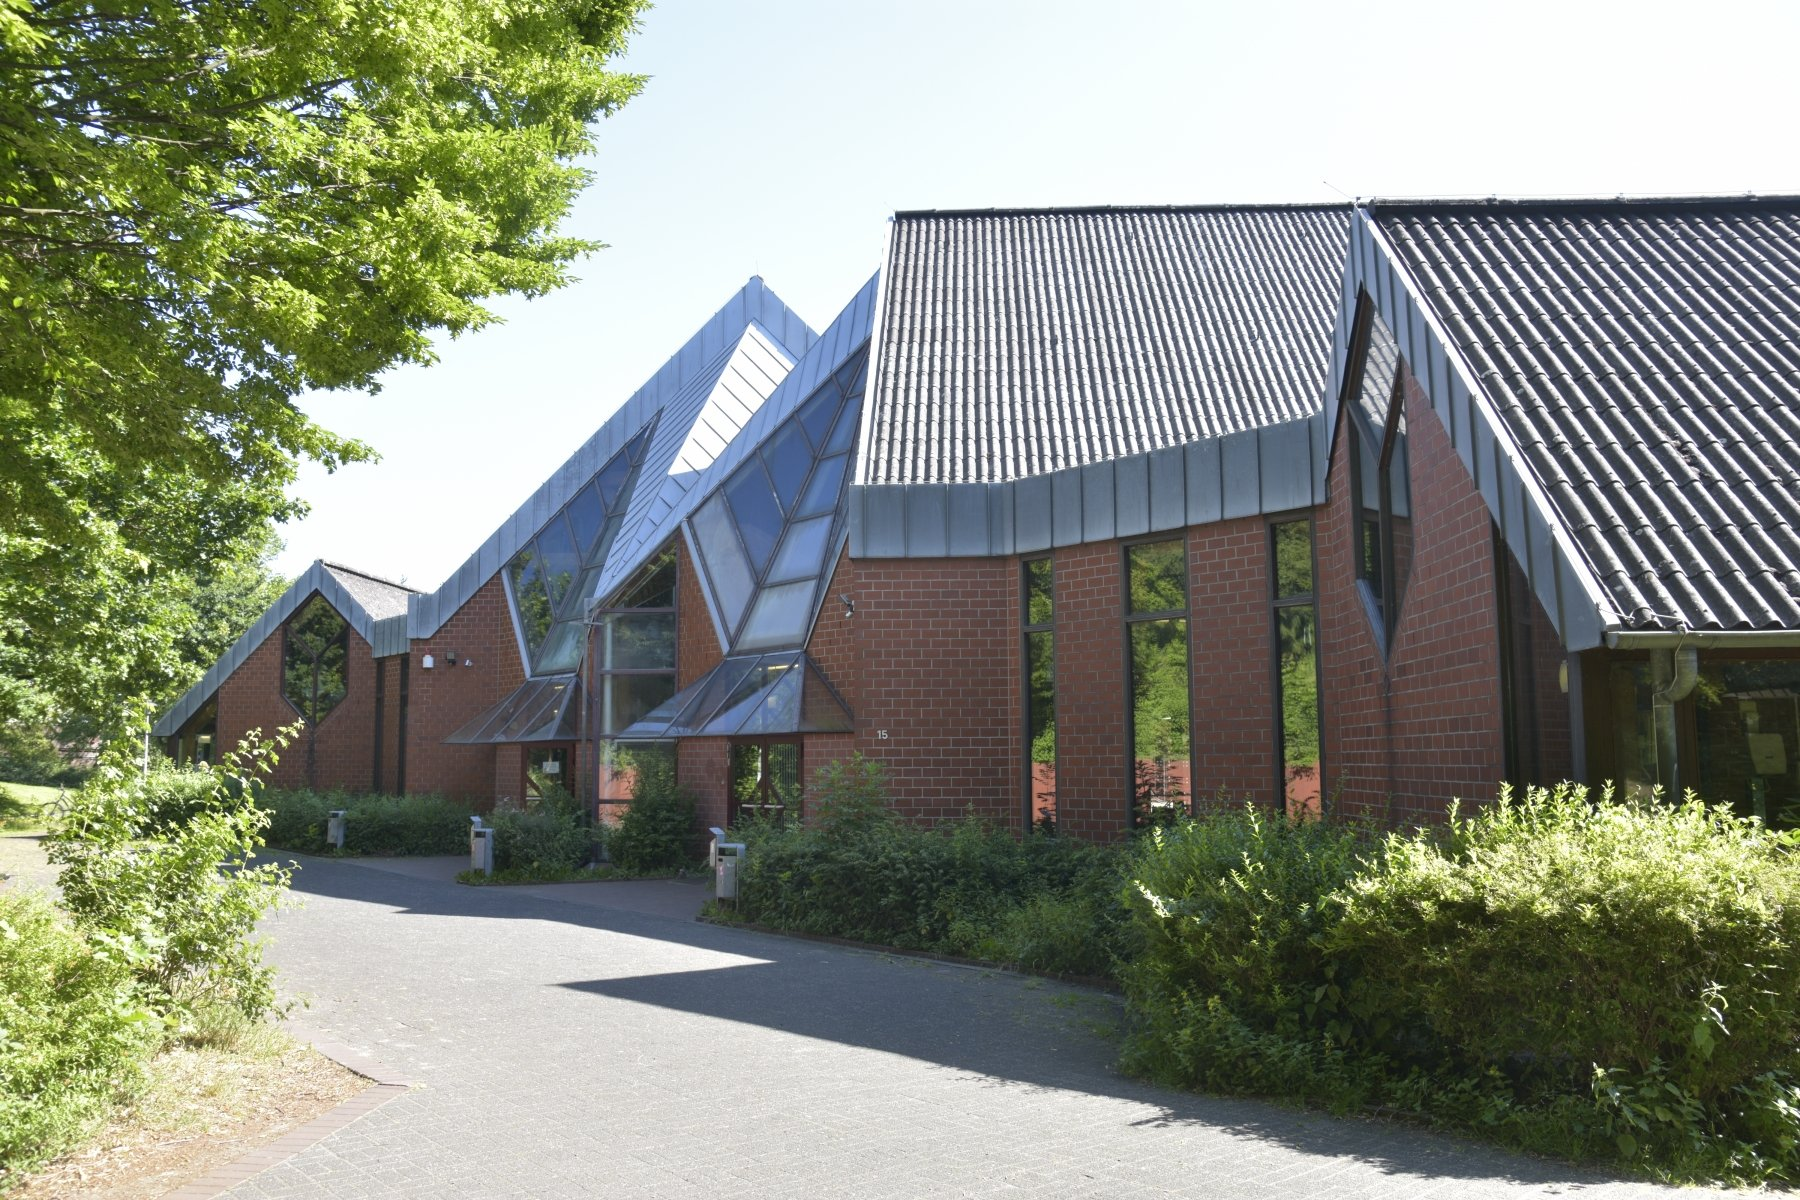 Das Westbad in Dorstfeld. (Foto: IN-StadtMagazine)